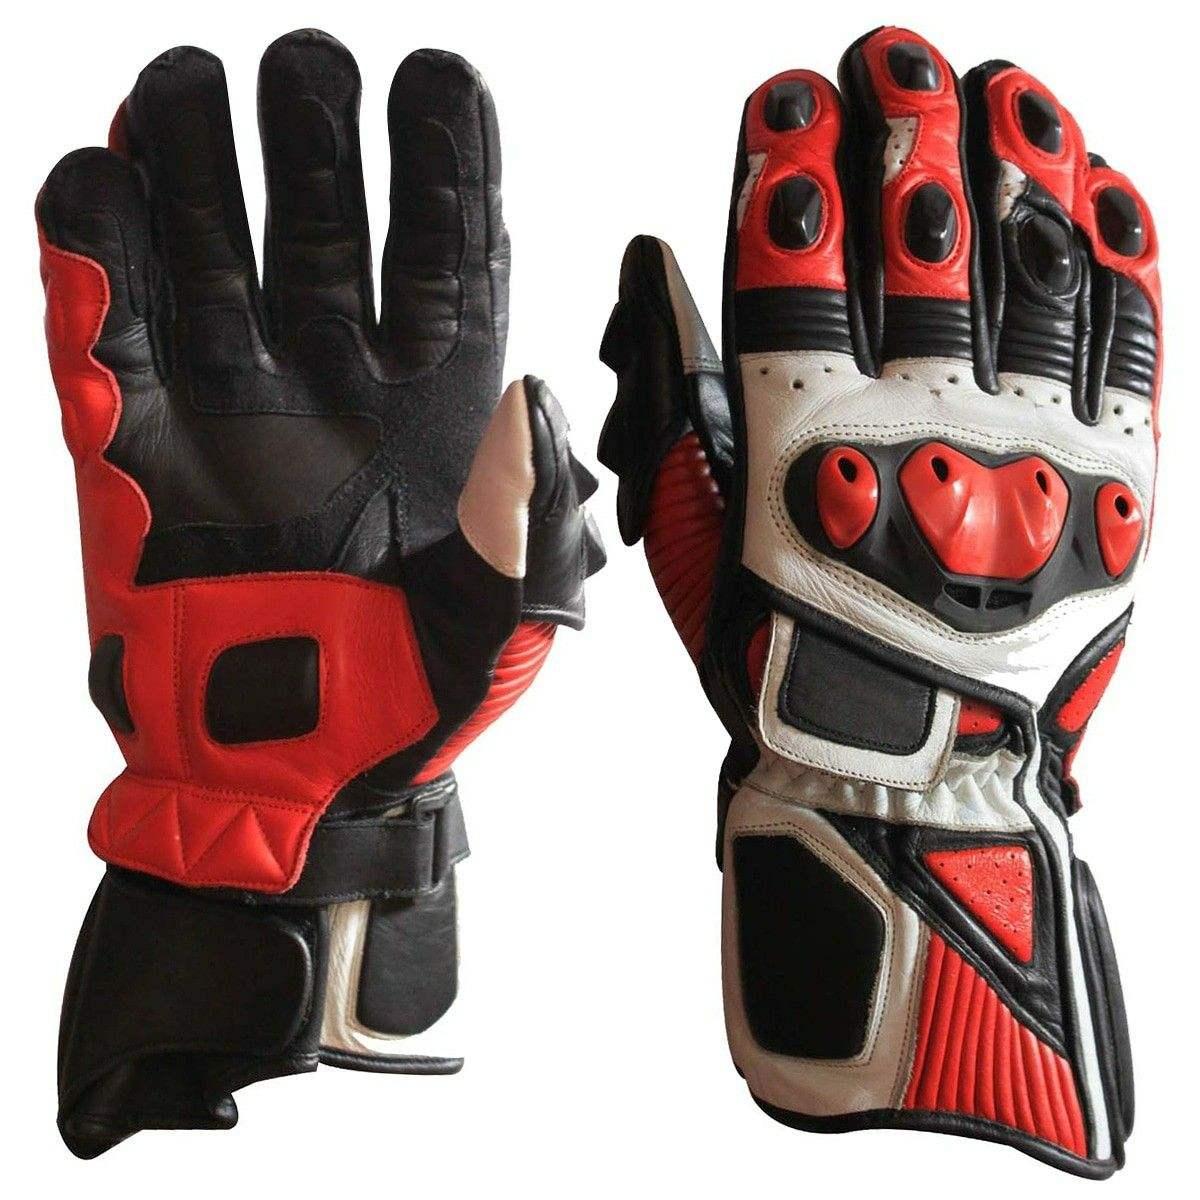 Anti slip bike riding glove high quality sport glove